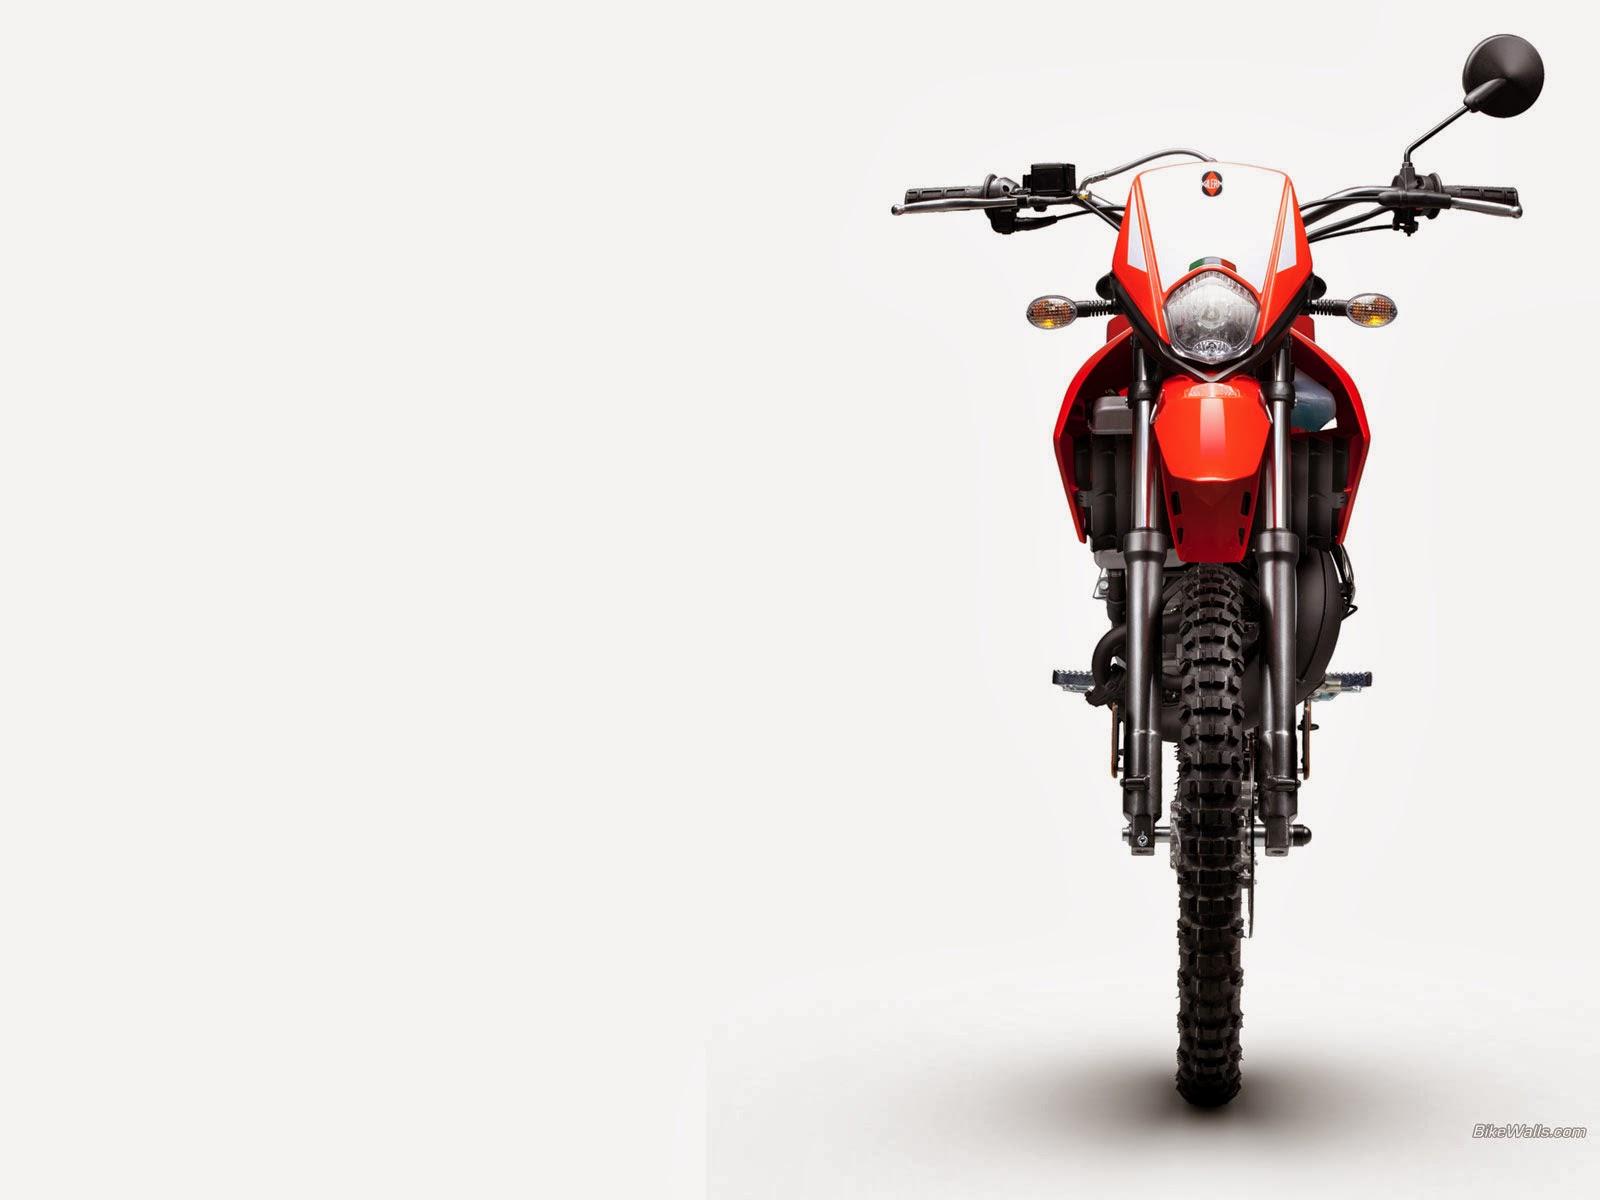 Yamaha Msii